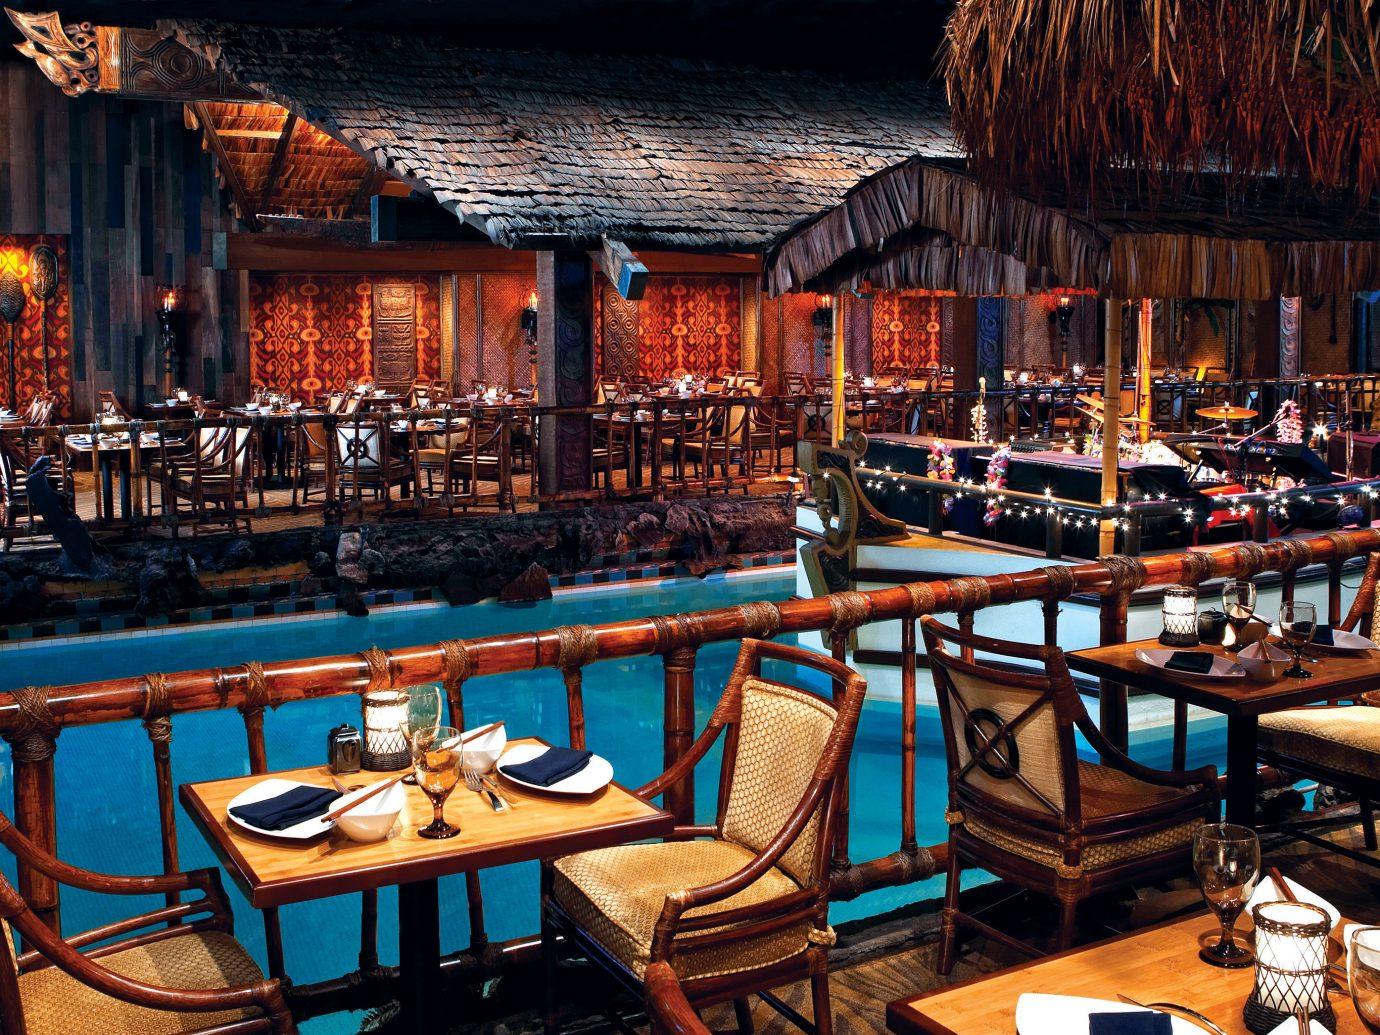 City Dining Drink Eat Luxury Nightlife Resort chair outdoor restaurant Bar estate tavern blue set furniture several grill